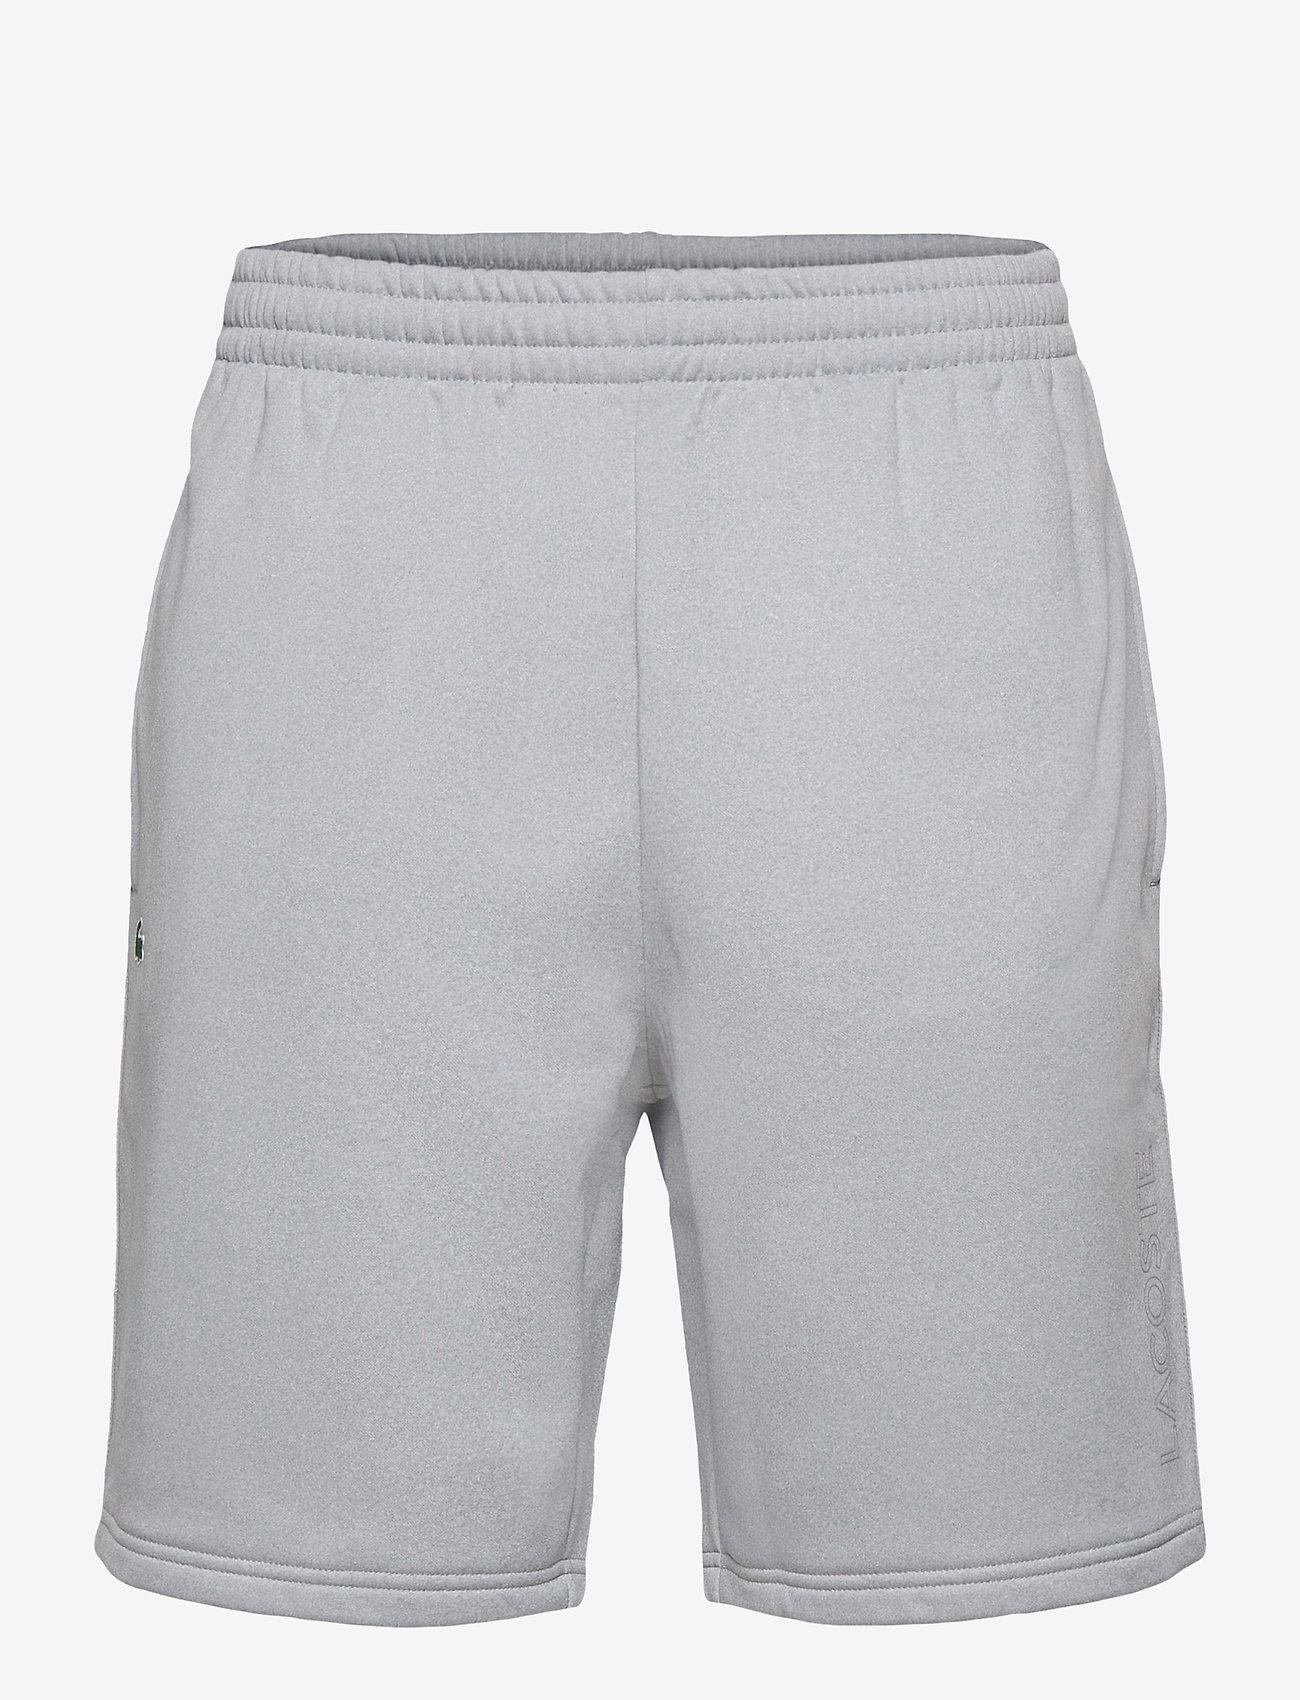 Lacoste - Men s shorts - training korte broek - silver chine/elephant grey - 0